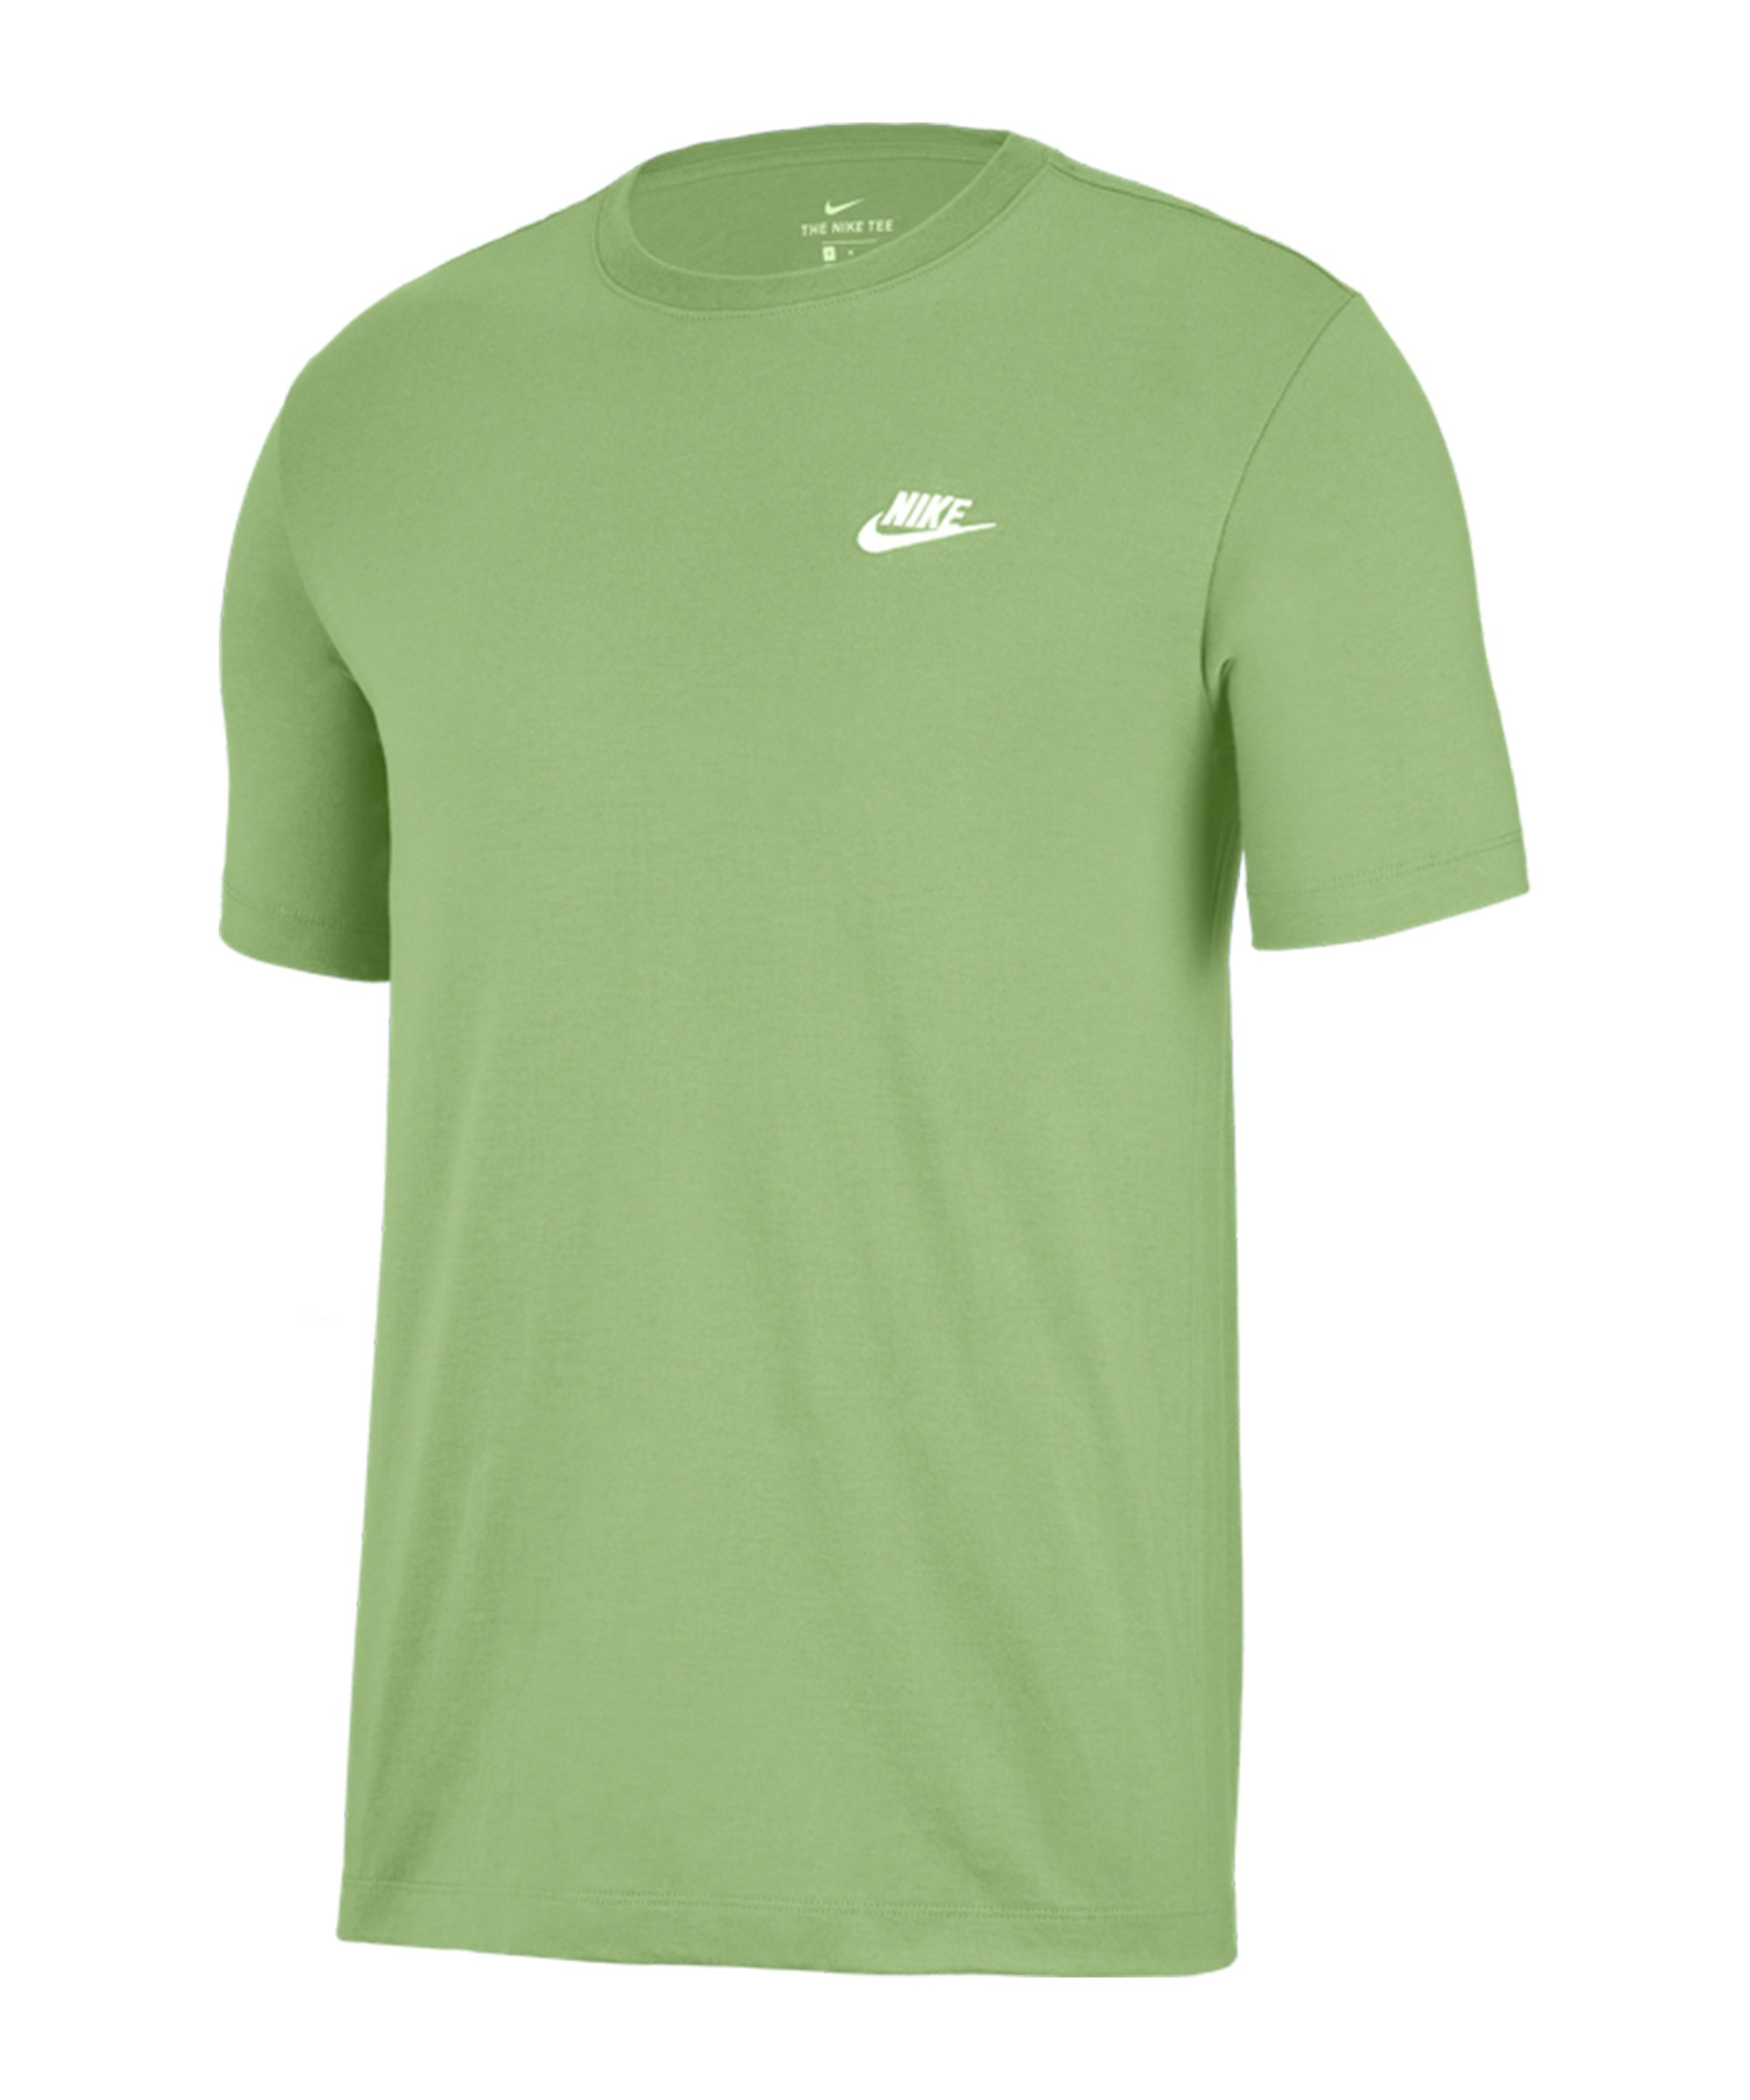 Nike Club T-Shirt Grün Weiss F383 - gruen